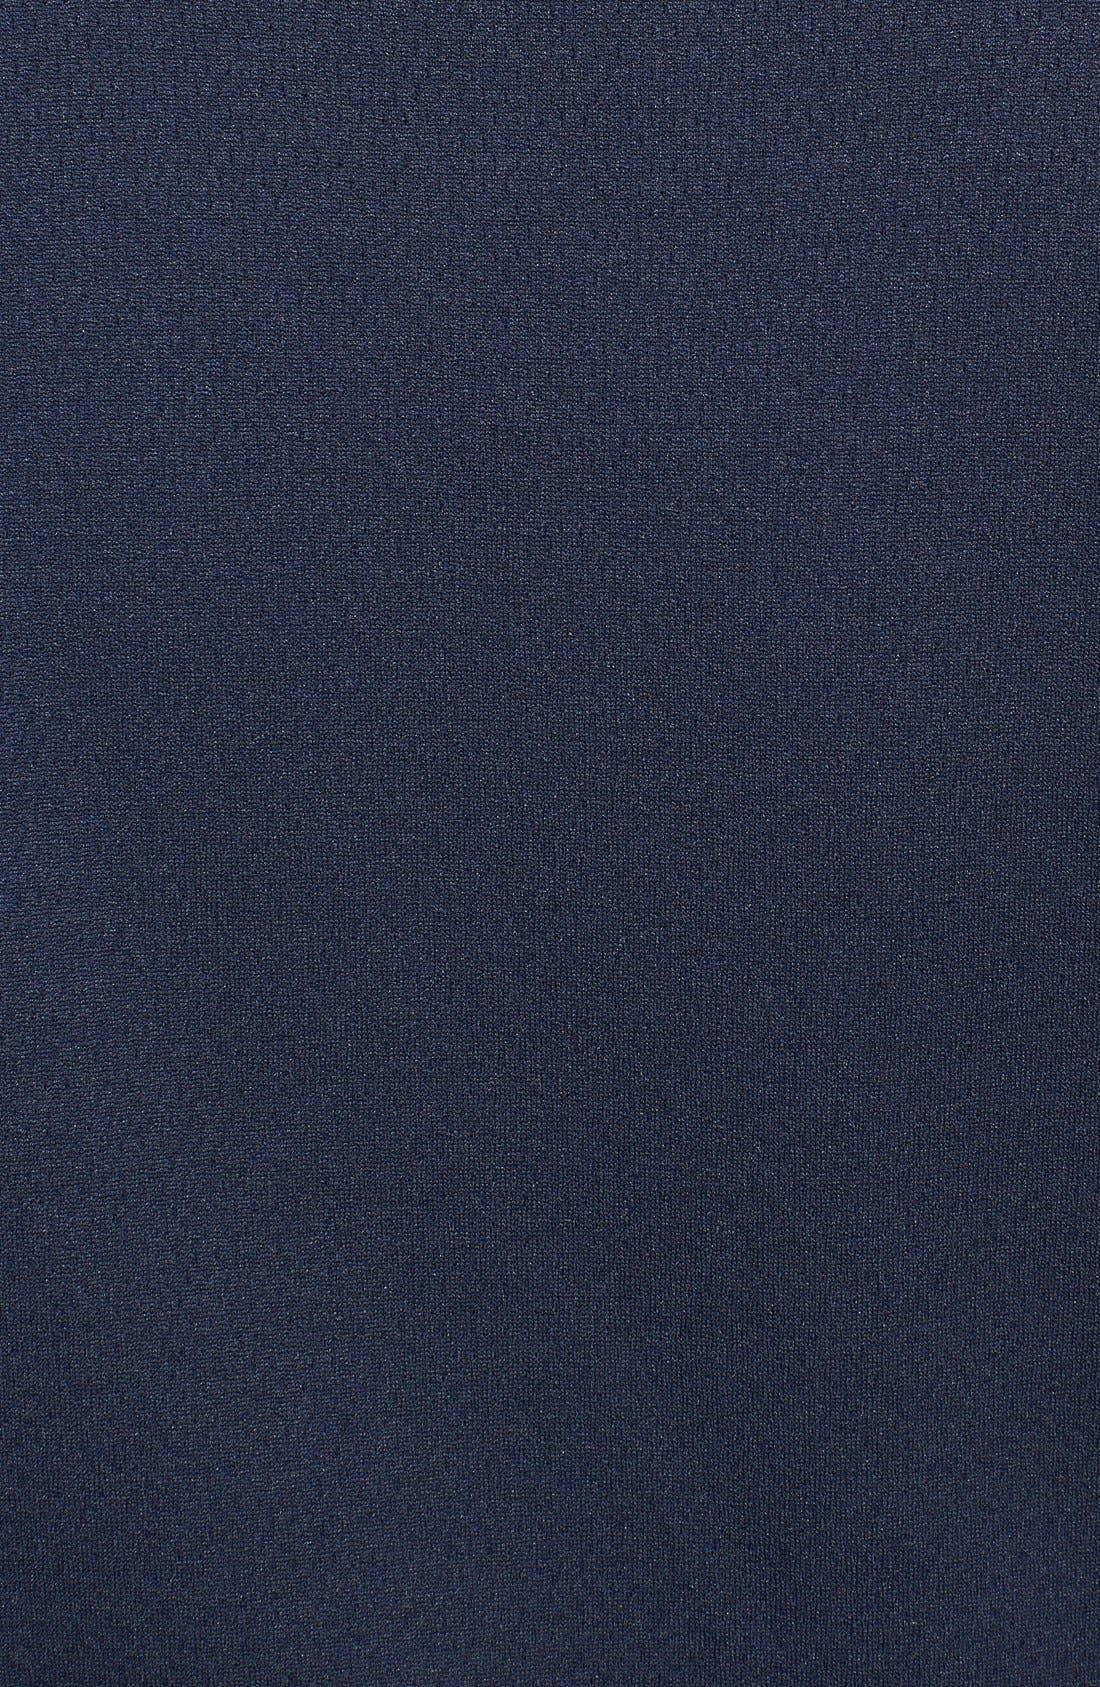 Alternate Image 3  - Cutter & Buck New York Giants - Edge DryTec Moisture Wicking Half Zip Pullover